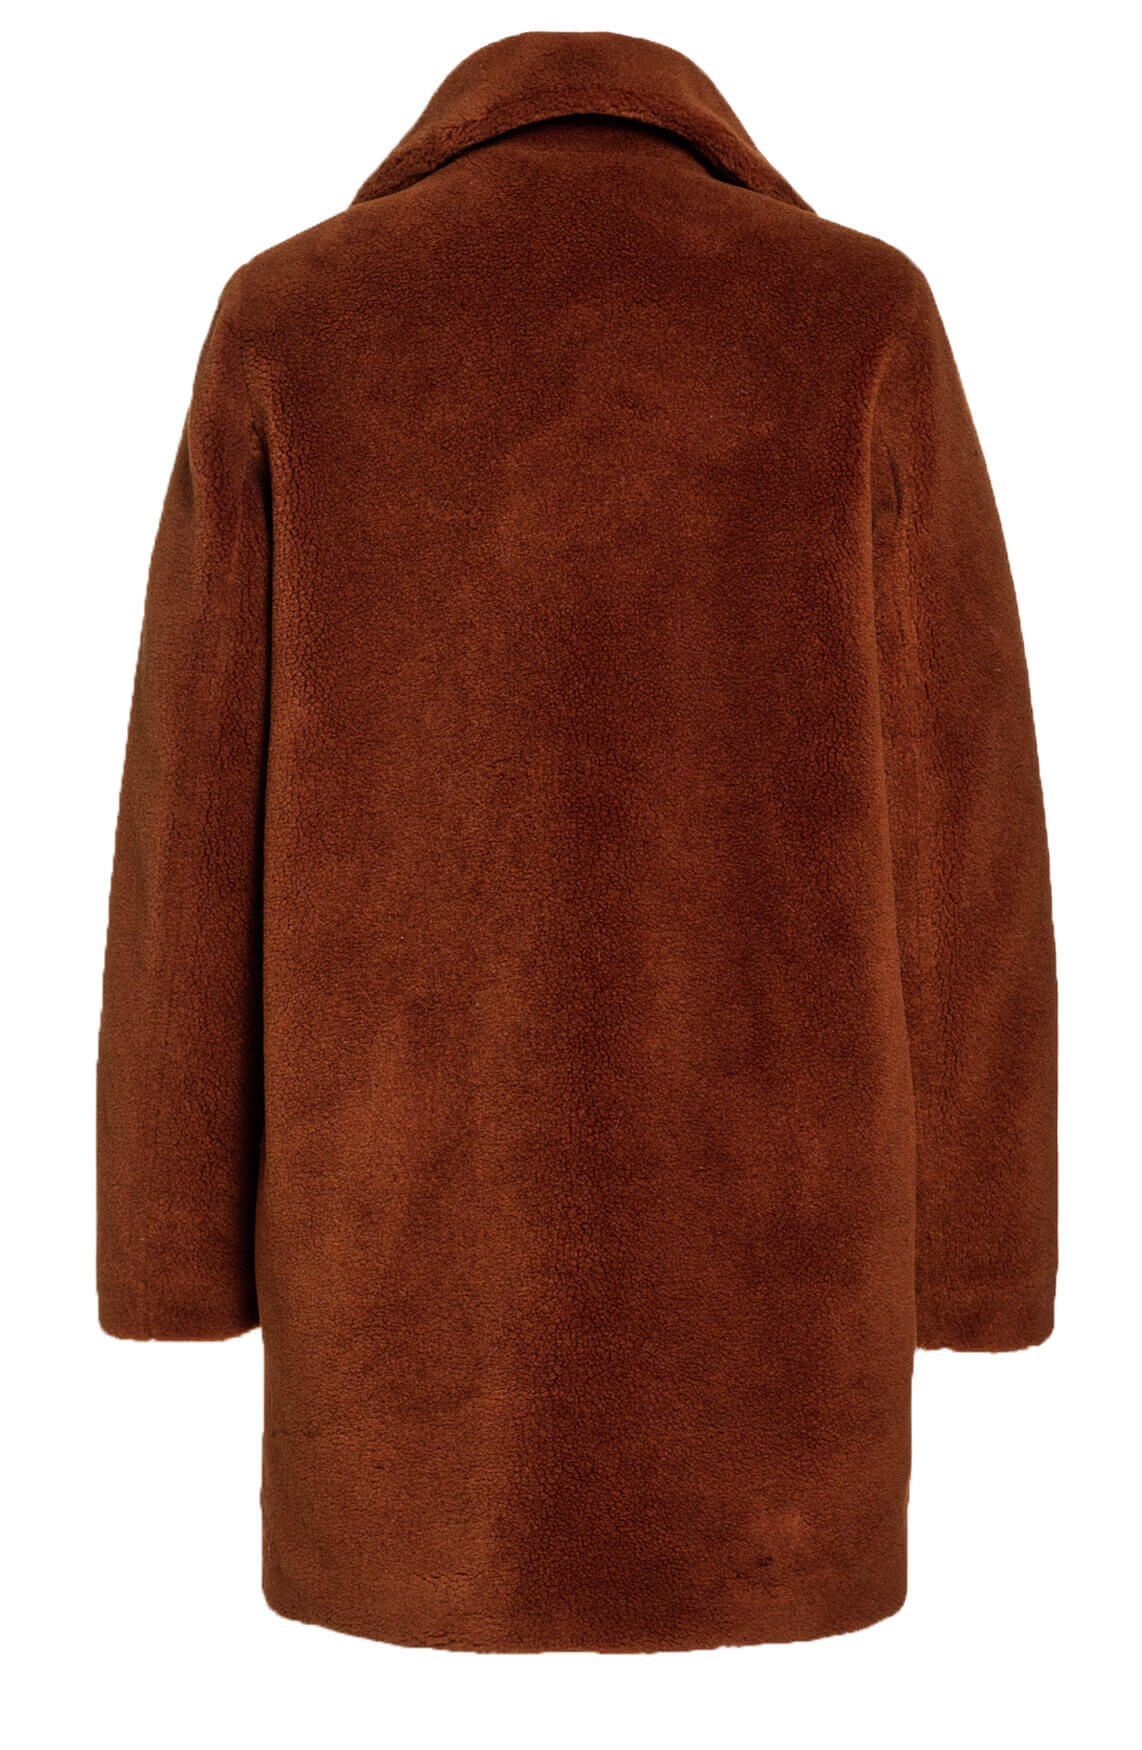 Beaumont Dames Teddy mantel Bruin